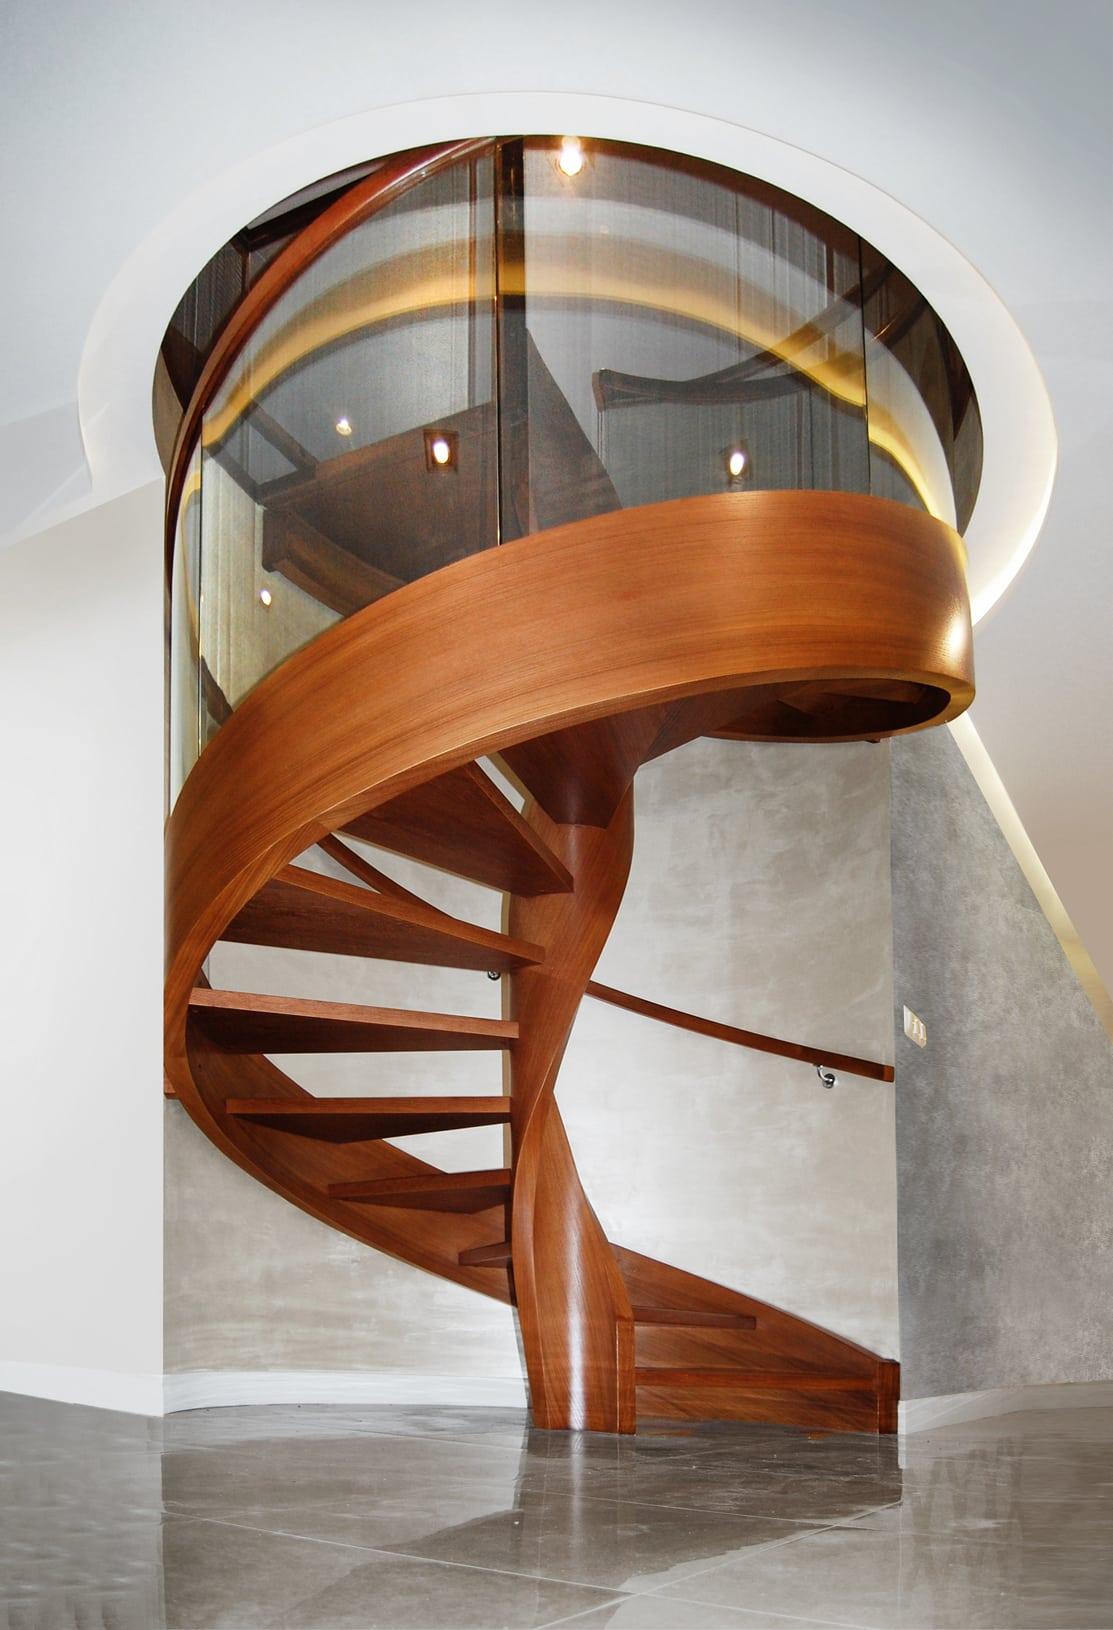 schody kręcone